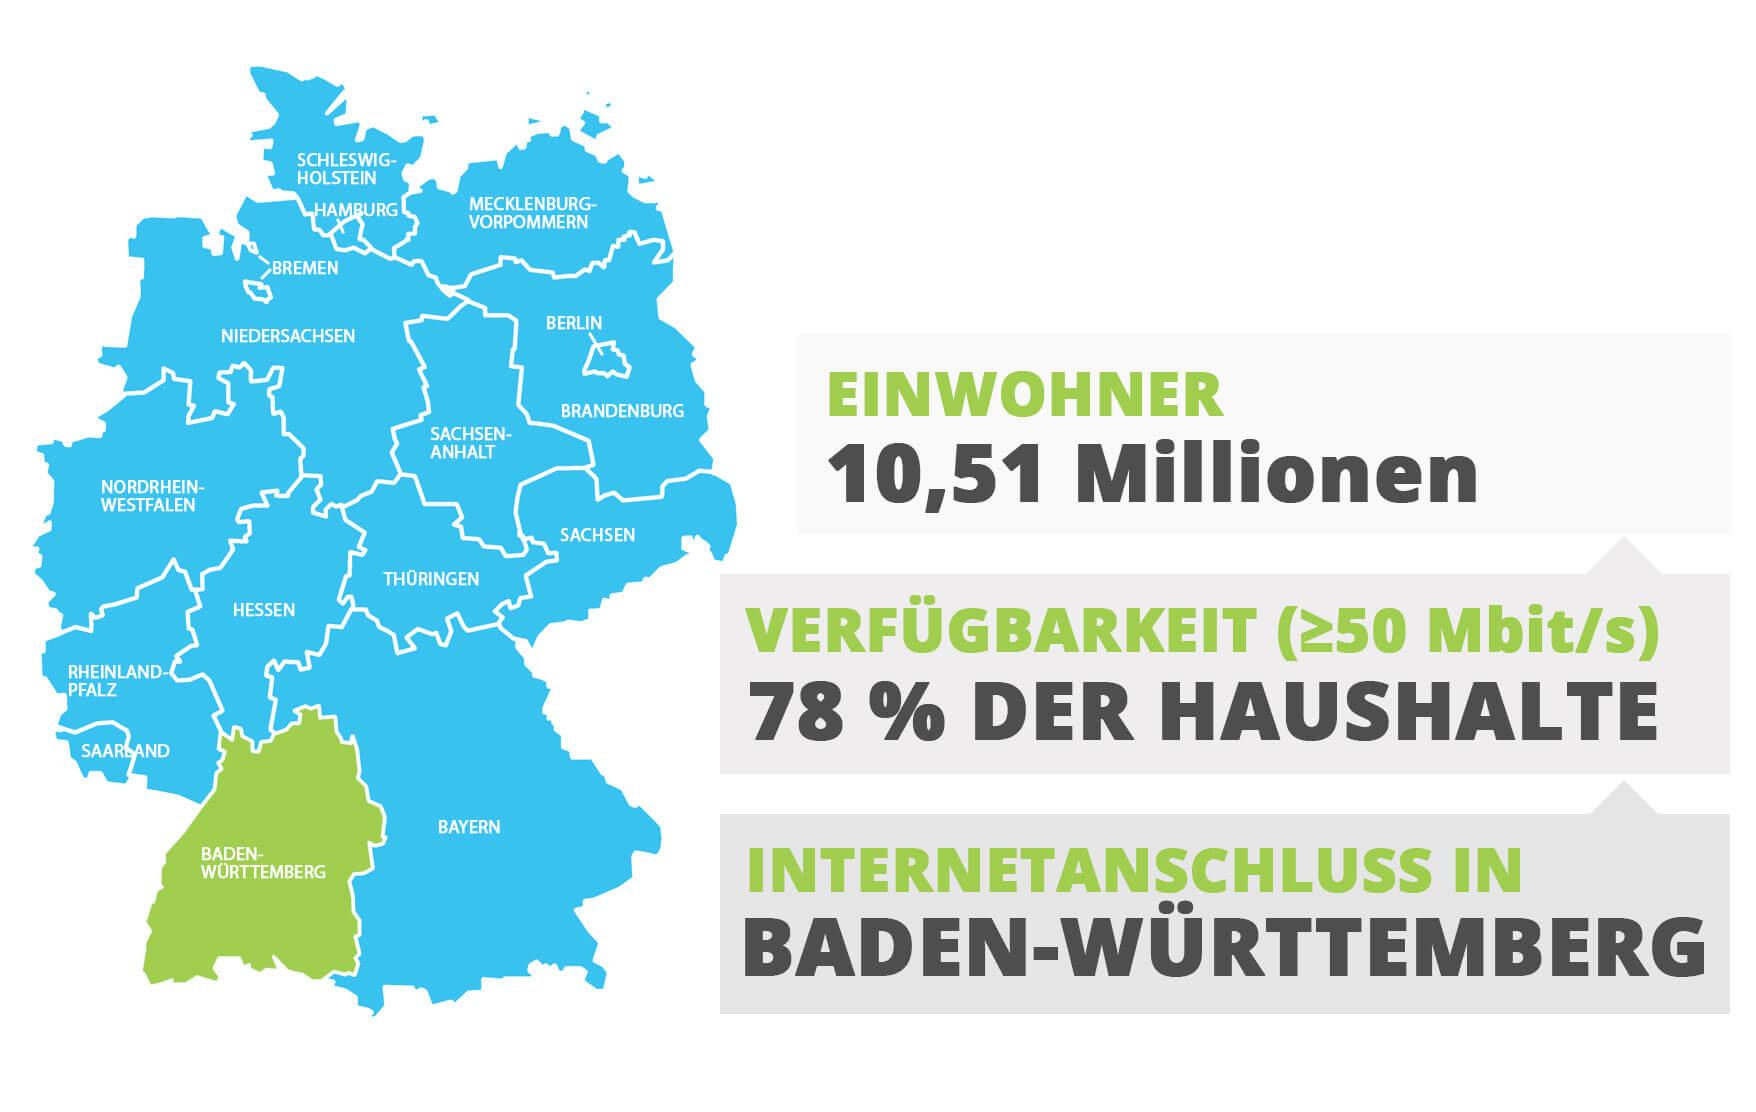 Internetanschluss in Baden-Württemberg